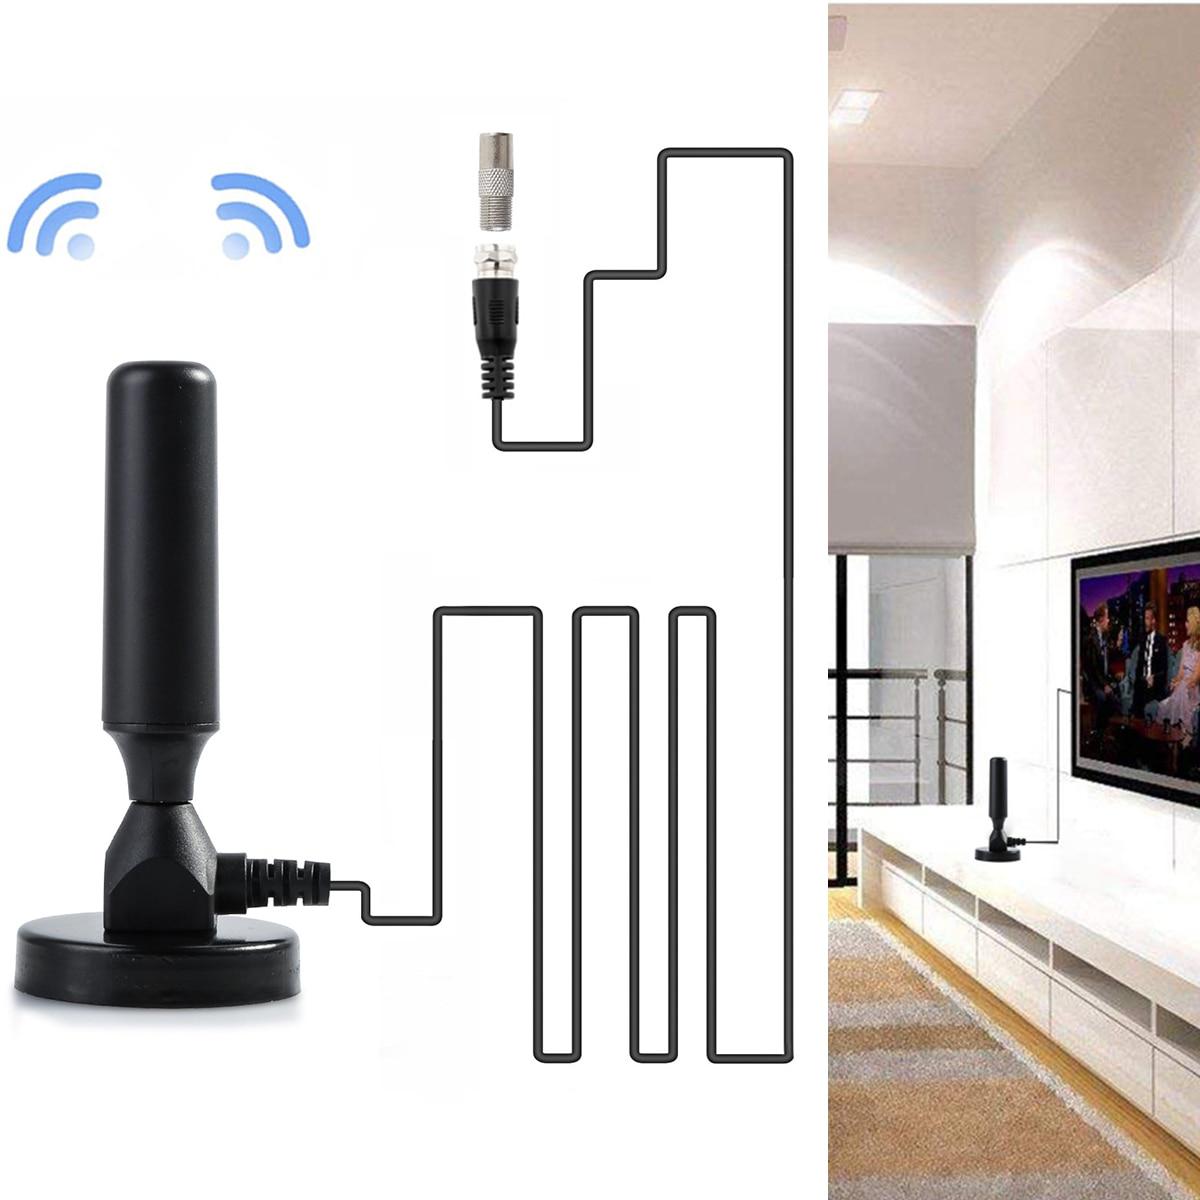 Antena FM 1080P USB DVB-T antenas interior TV receptor Digital con Base magnética para TV HDTV DTMB ATSC ISDB decodificador